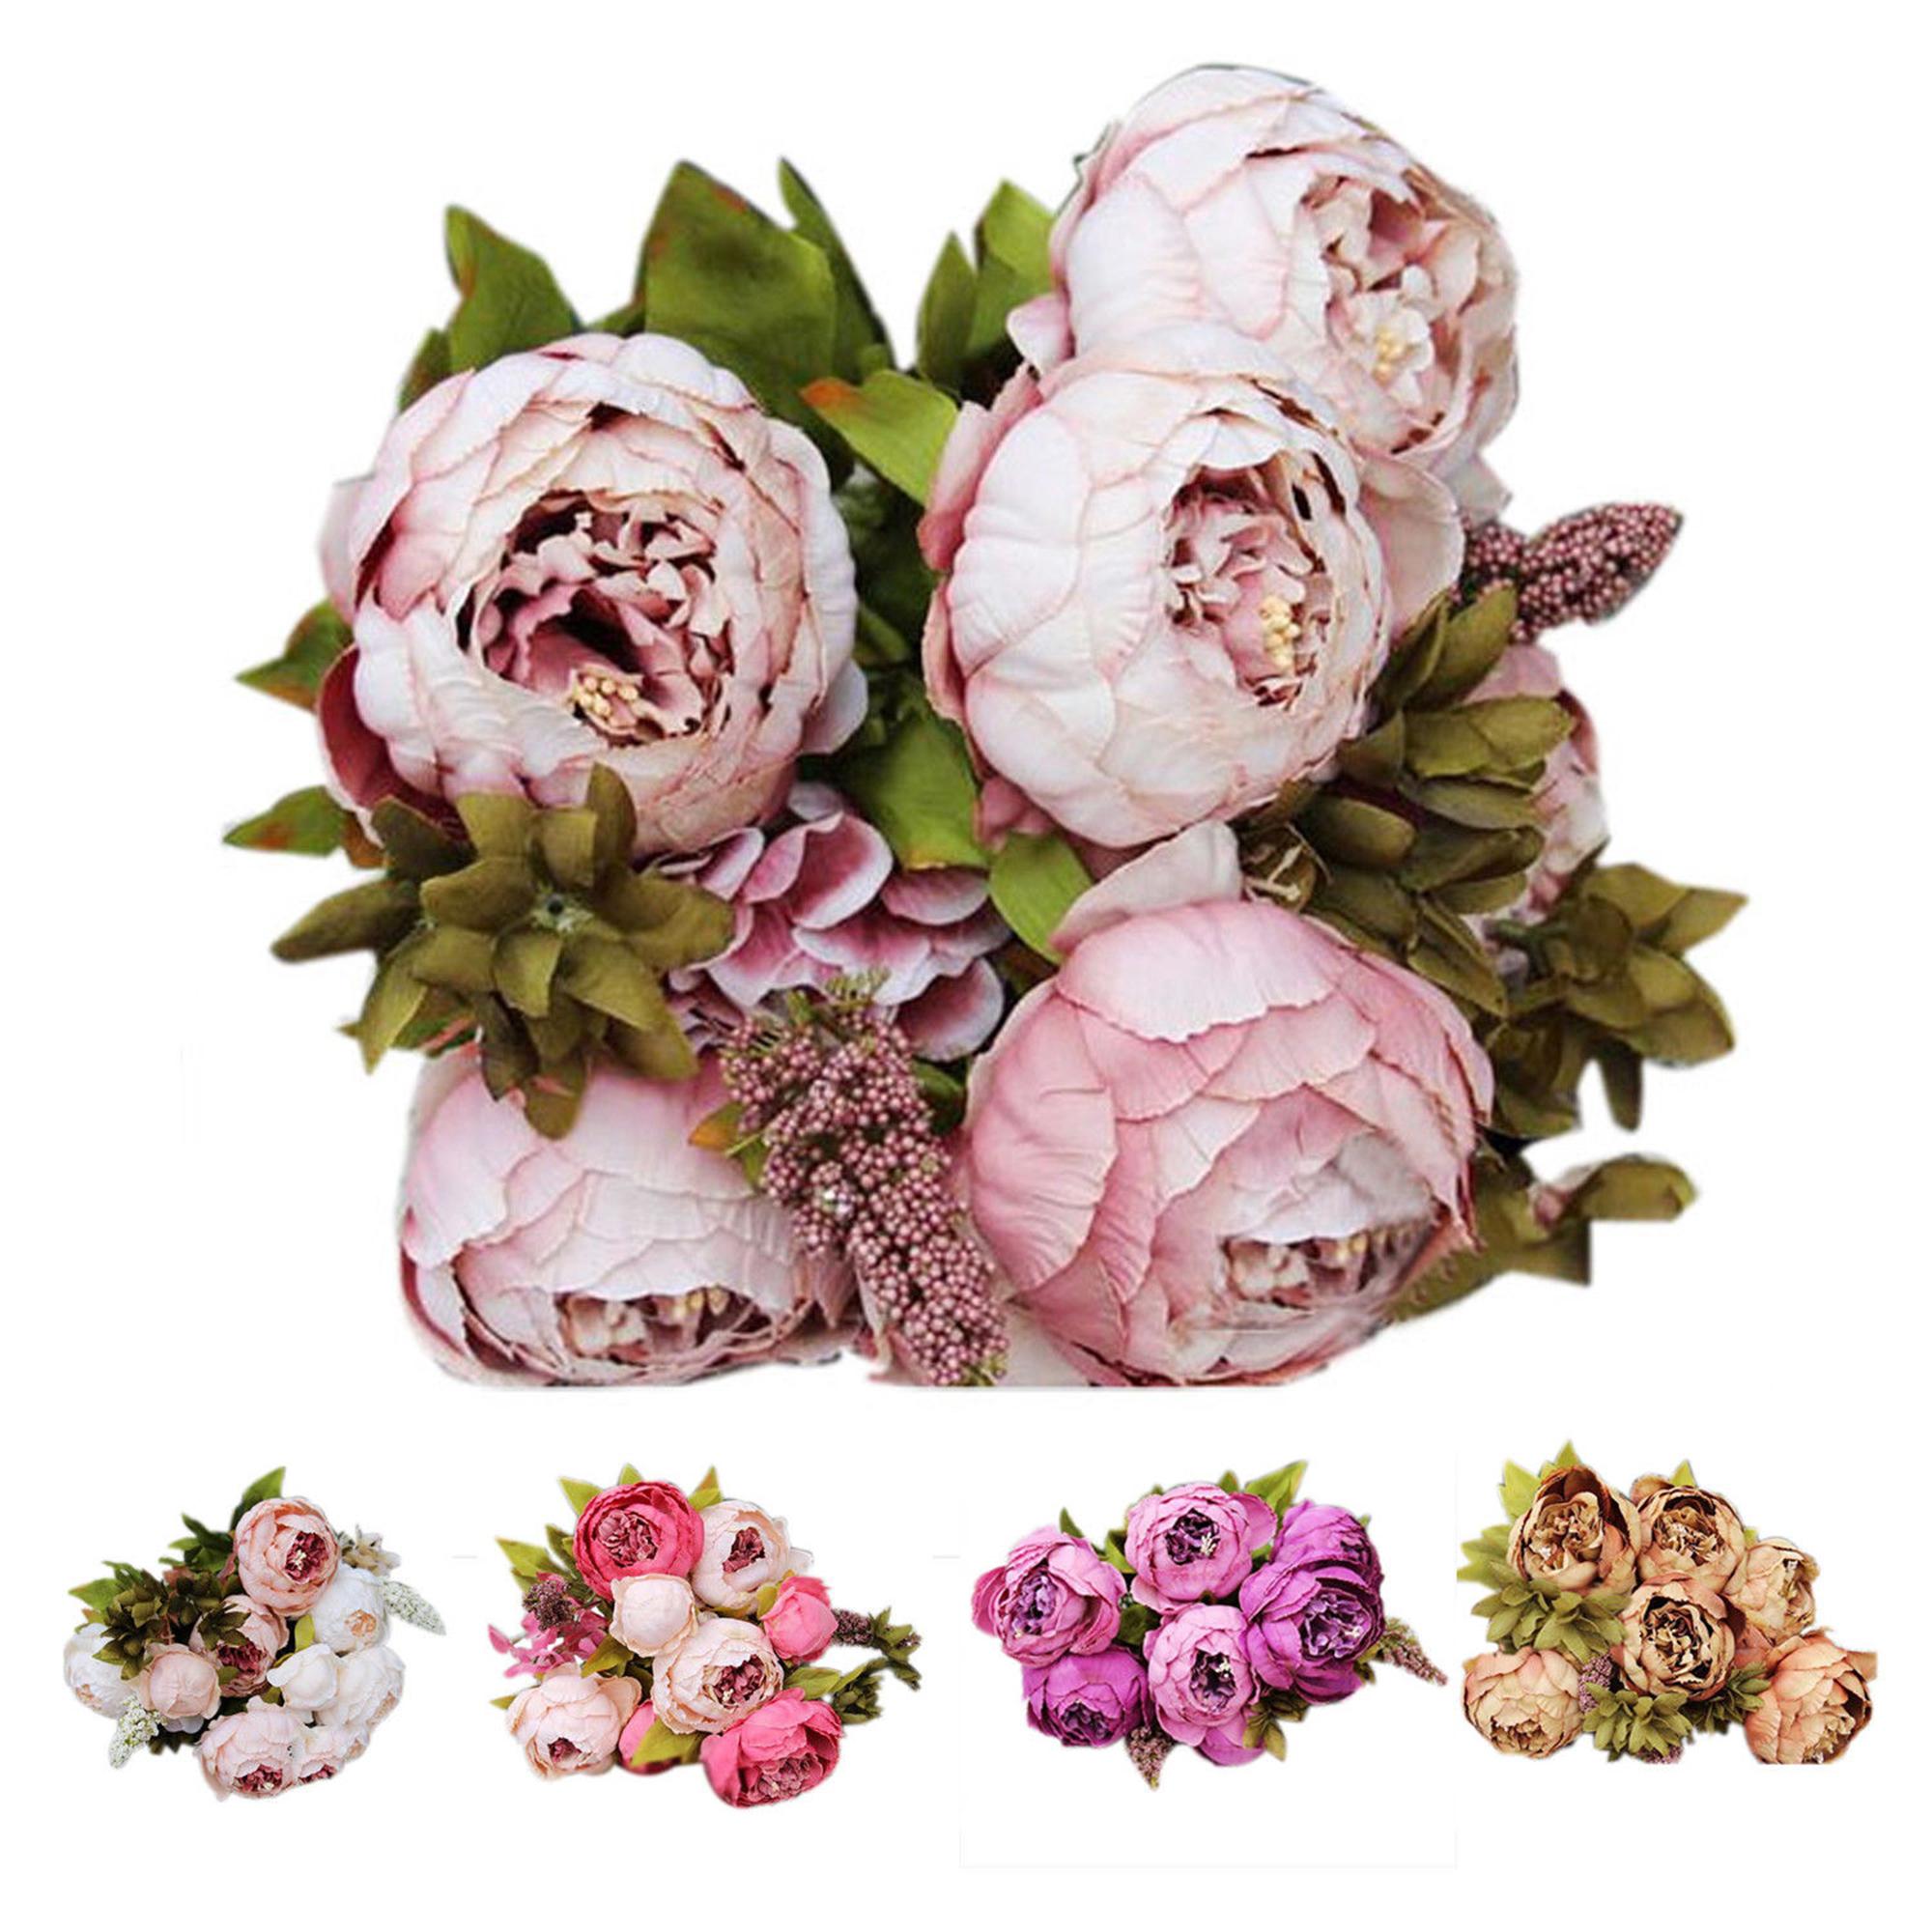 CUH Artificial Peony Bouquet Flower Arrangements Silk for Bedding Wedding Office Living Room Meeting Room Garden Floral